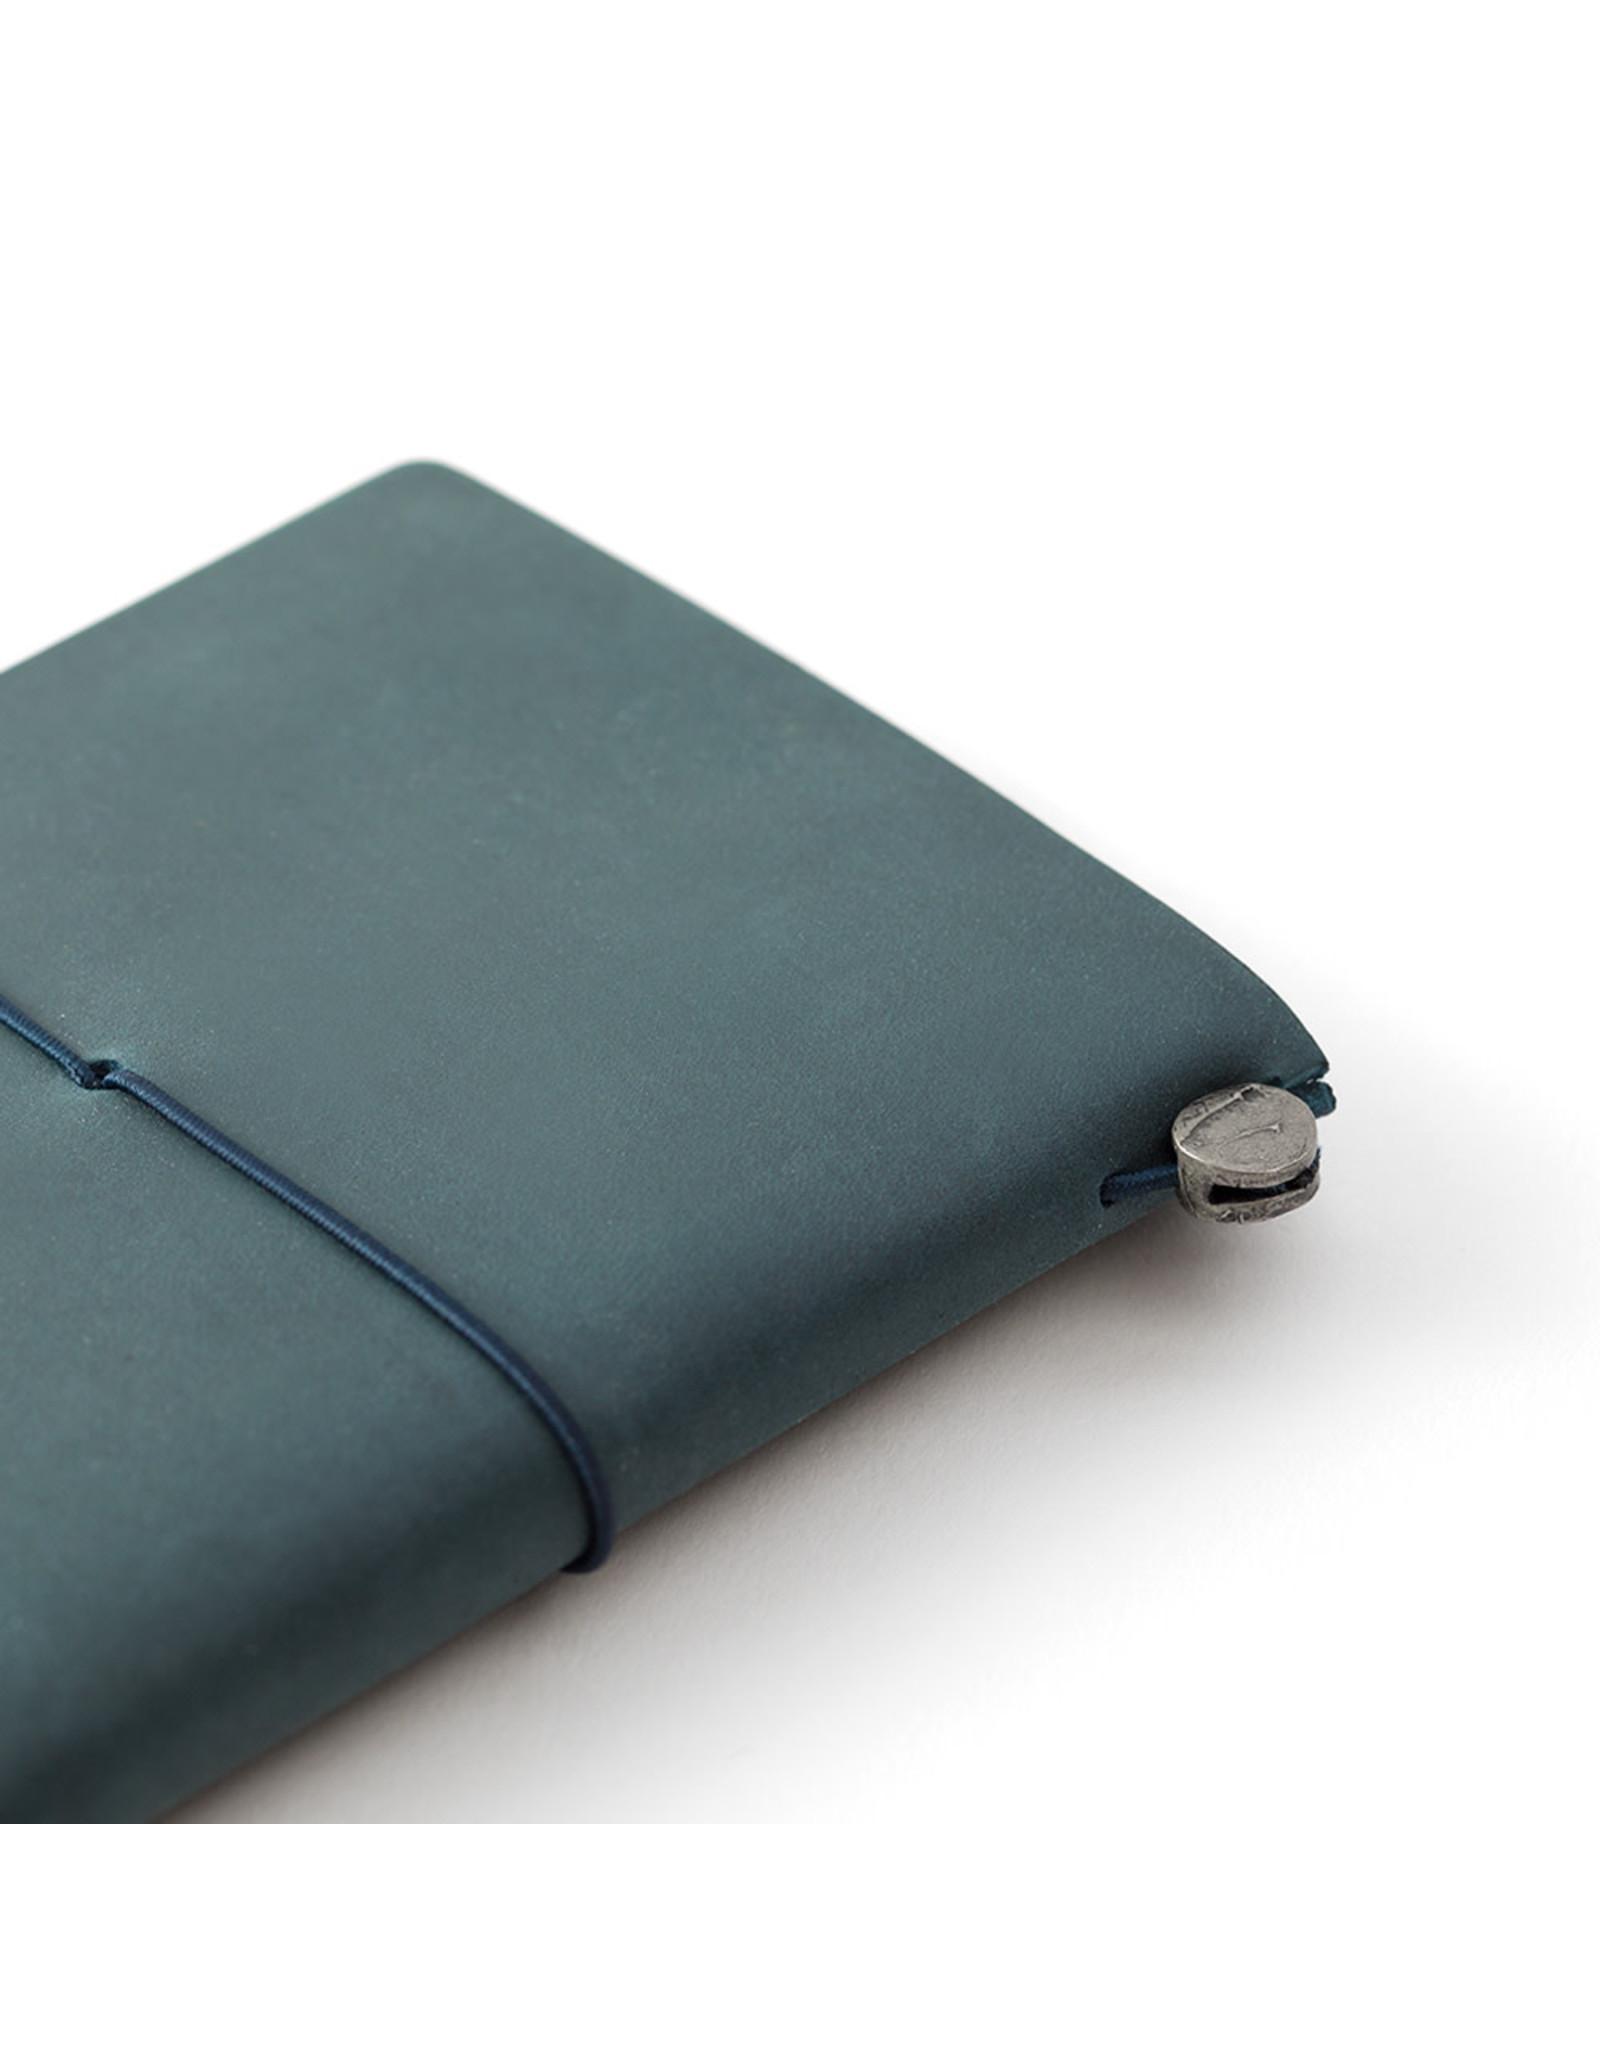 Traveler's Company TRAVELER'S NOTEBOOK PASSPORT SIZE BLUE